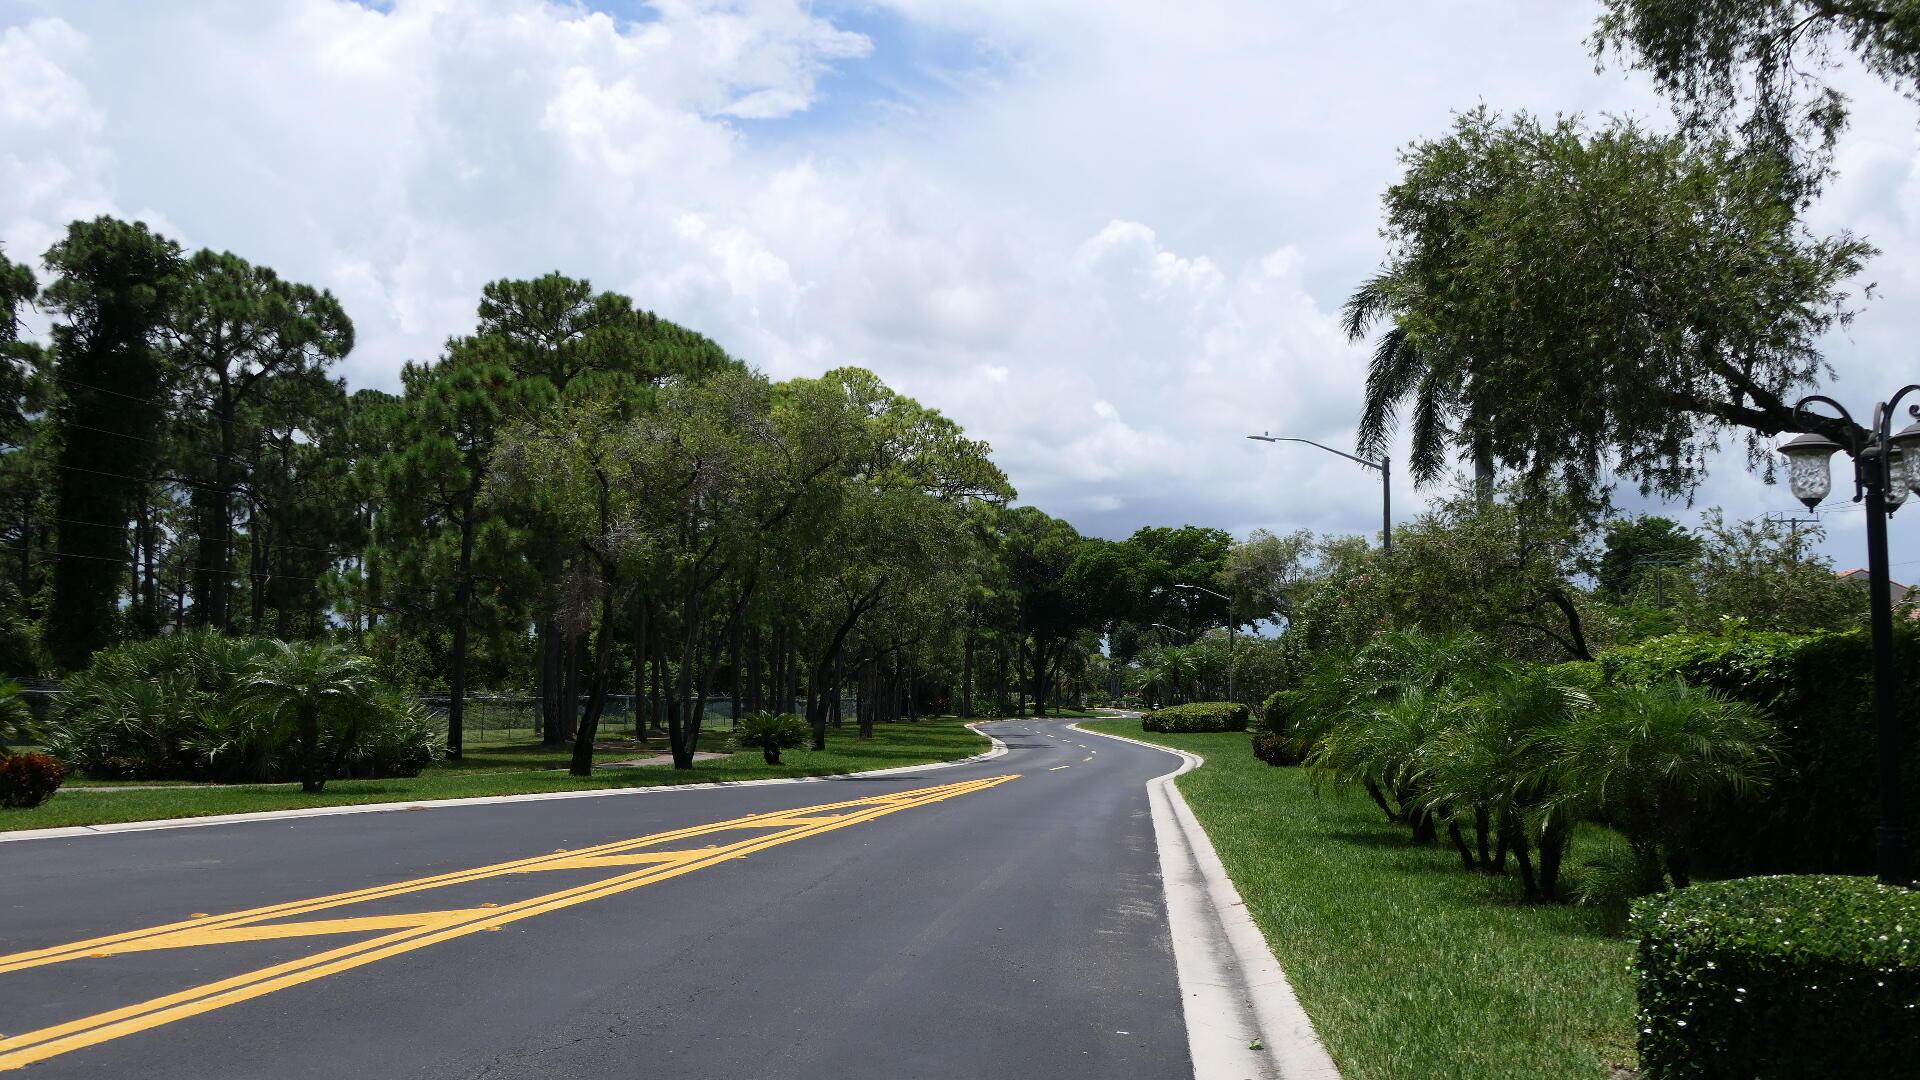 10804 Bahama Palm Way 101 Boynton Beach, FL 33437 photo 49